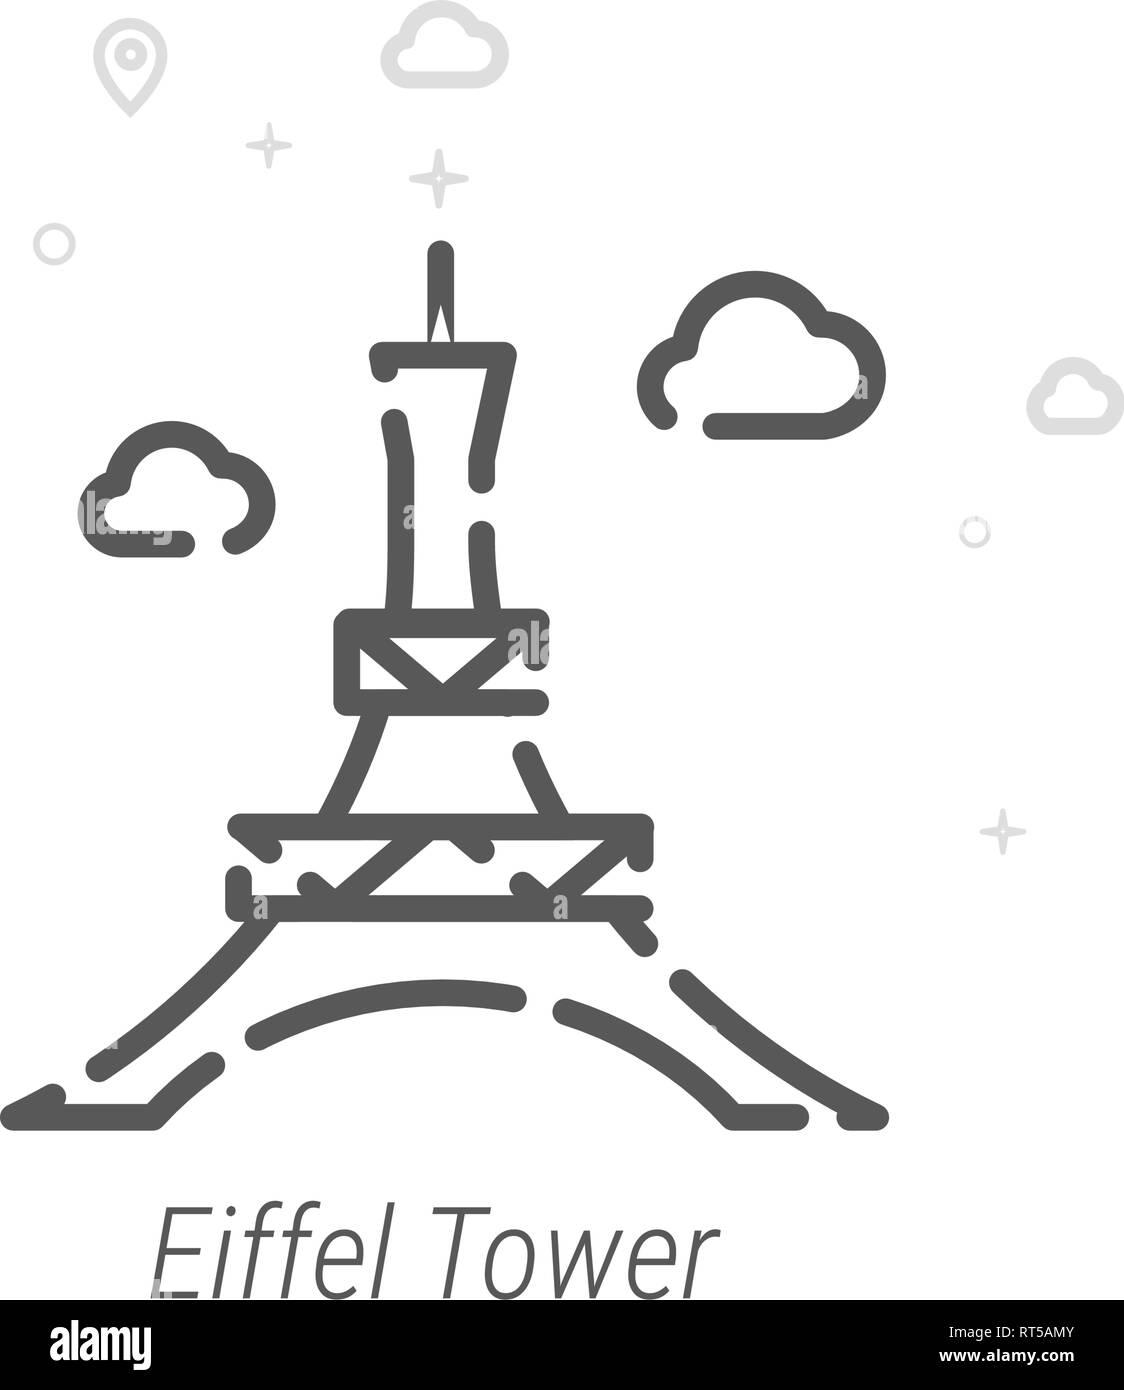 Eiffel Tower, Paris Vector Line Icon. Historical Landmarks Symbol, Pictogram, Sign. Light Abstract Geometric Background. Editable Stroke. Adjust Line  - Stock Vector